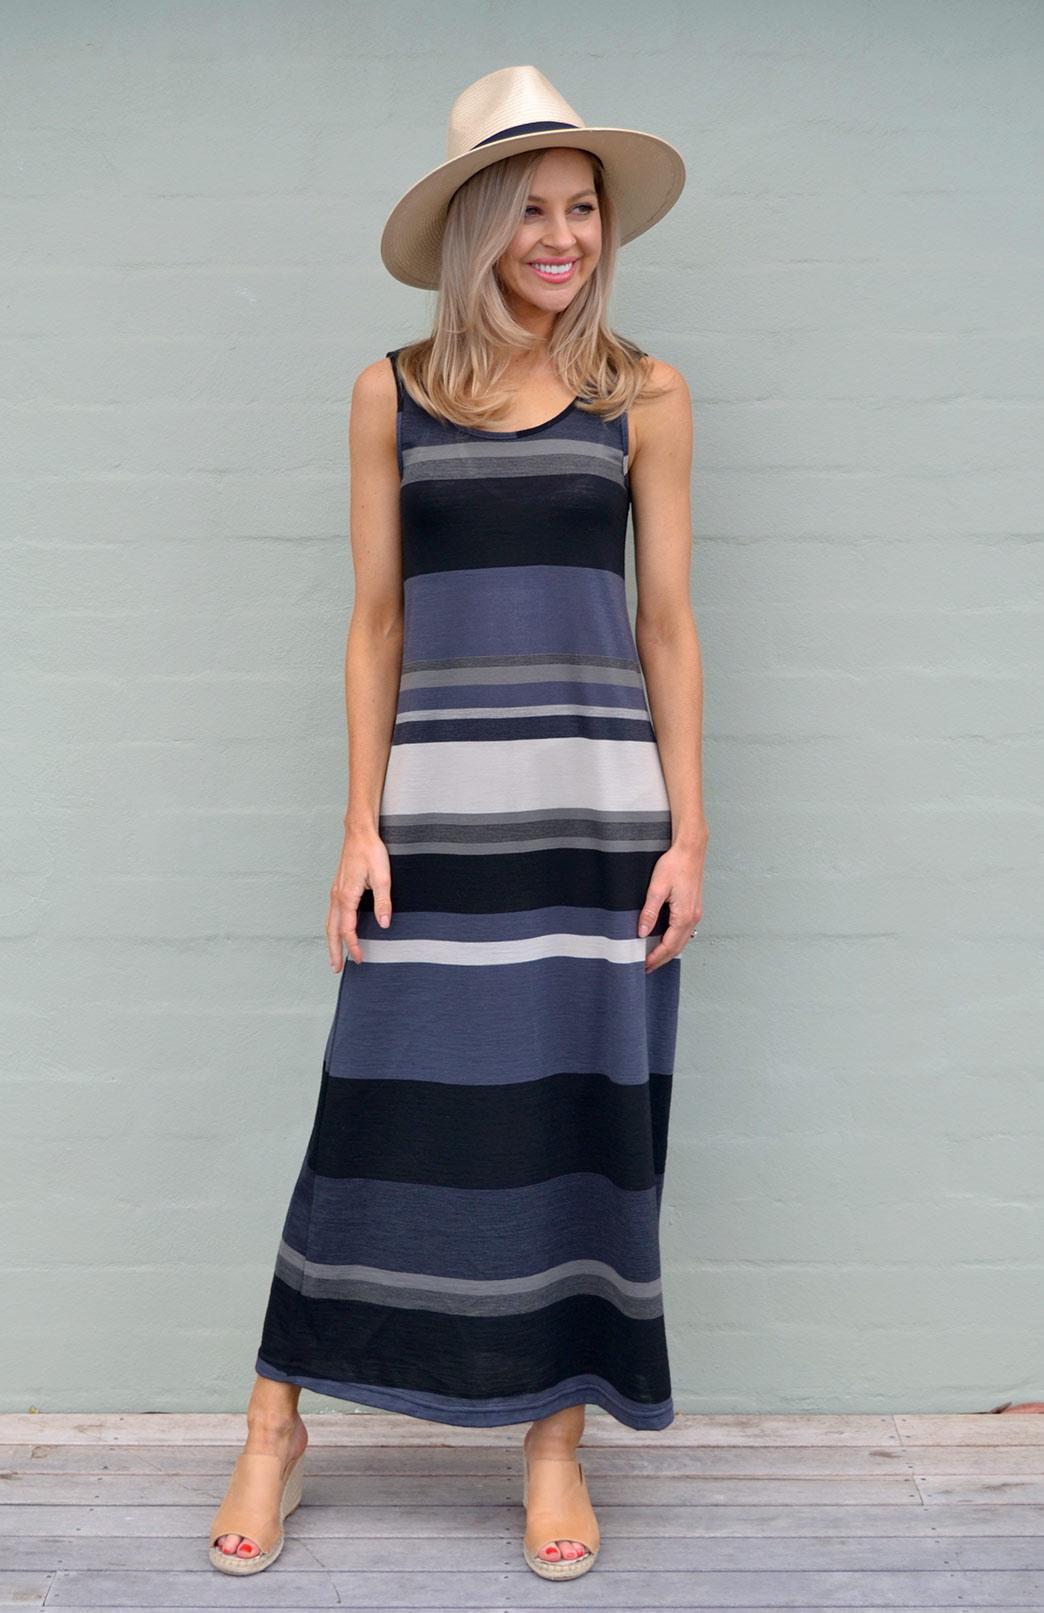 Maxi Dress - Multi Striped - Women's Merino Wool Black and Grey Multi Striped Maxi Dress with Scoop Neckline - Smitten Merino Tasmania Australia